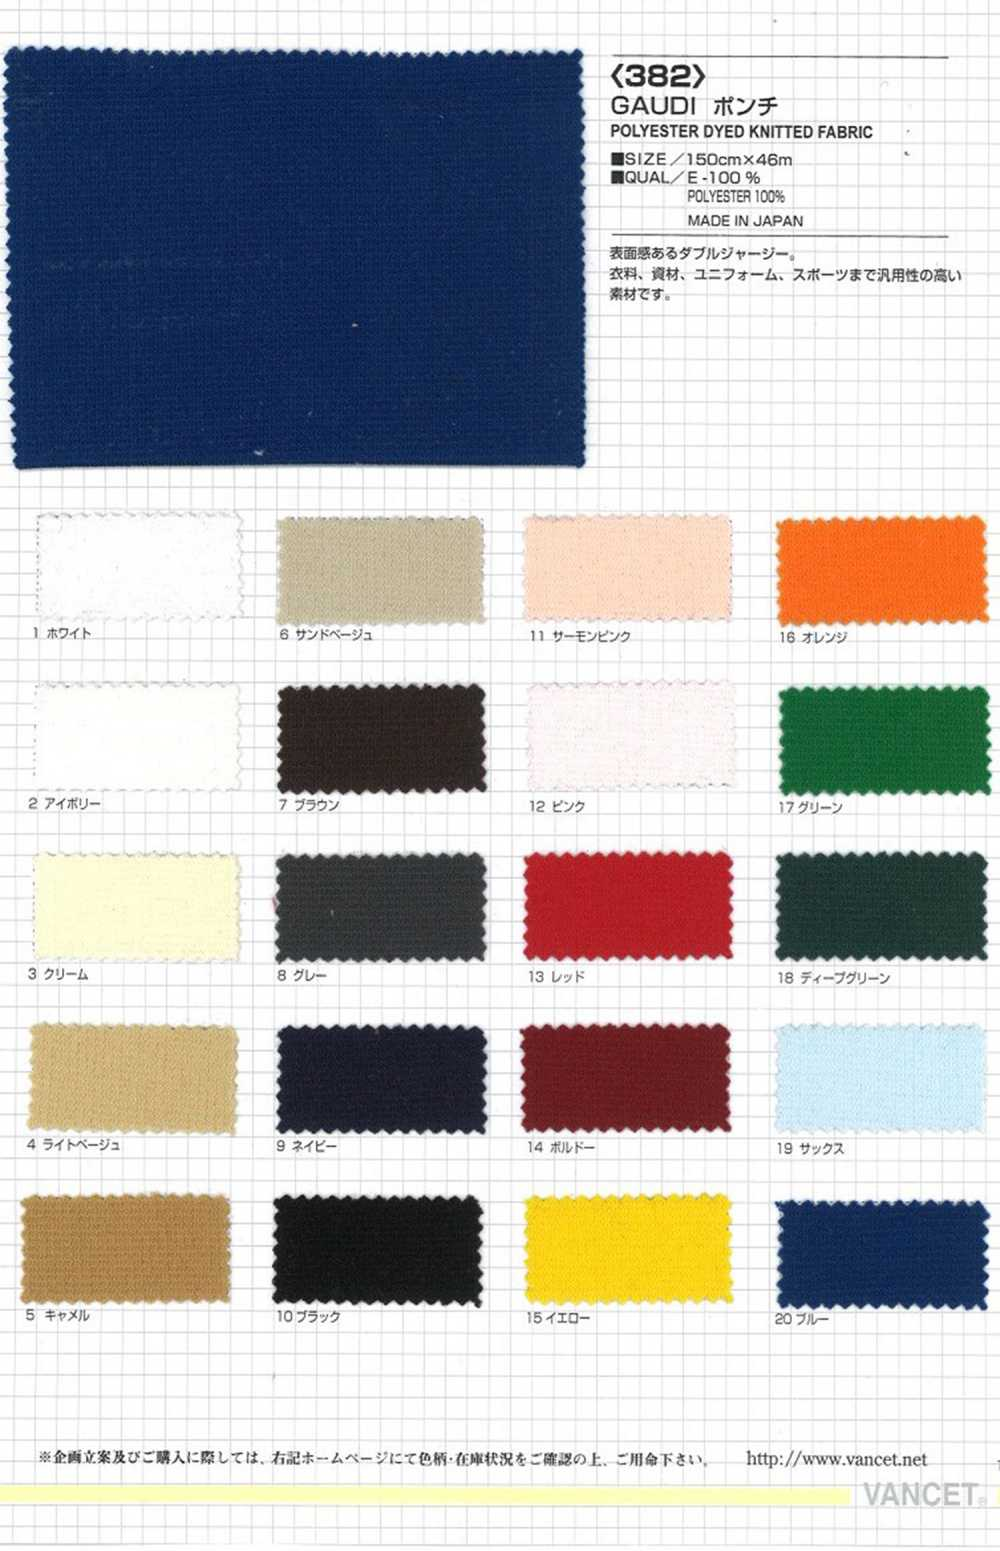 382 GAUDI ポンチ[生地] VANCET/オークラ商事 - ApparelX アパレル資材卸通販